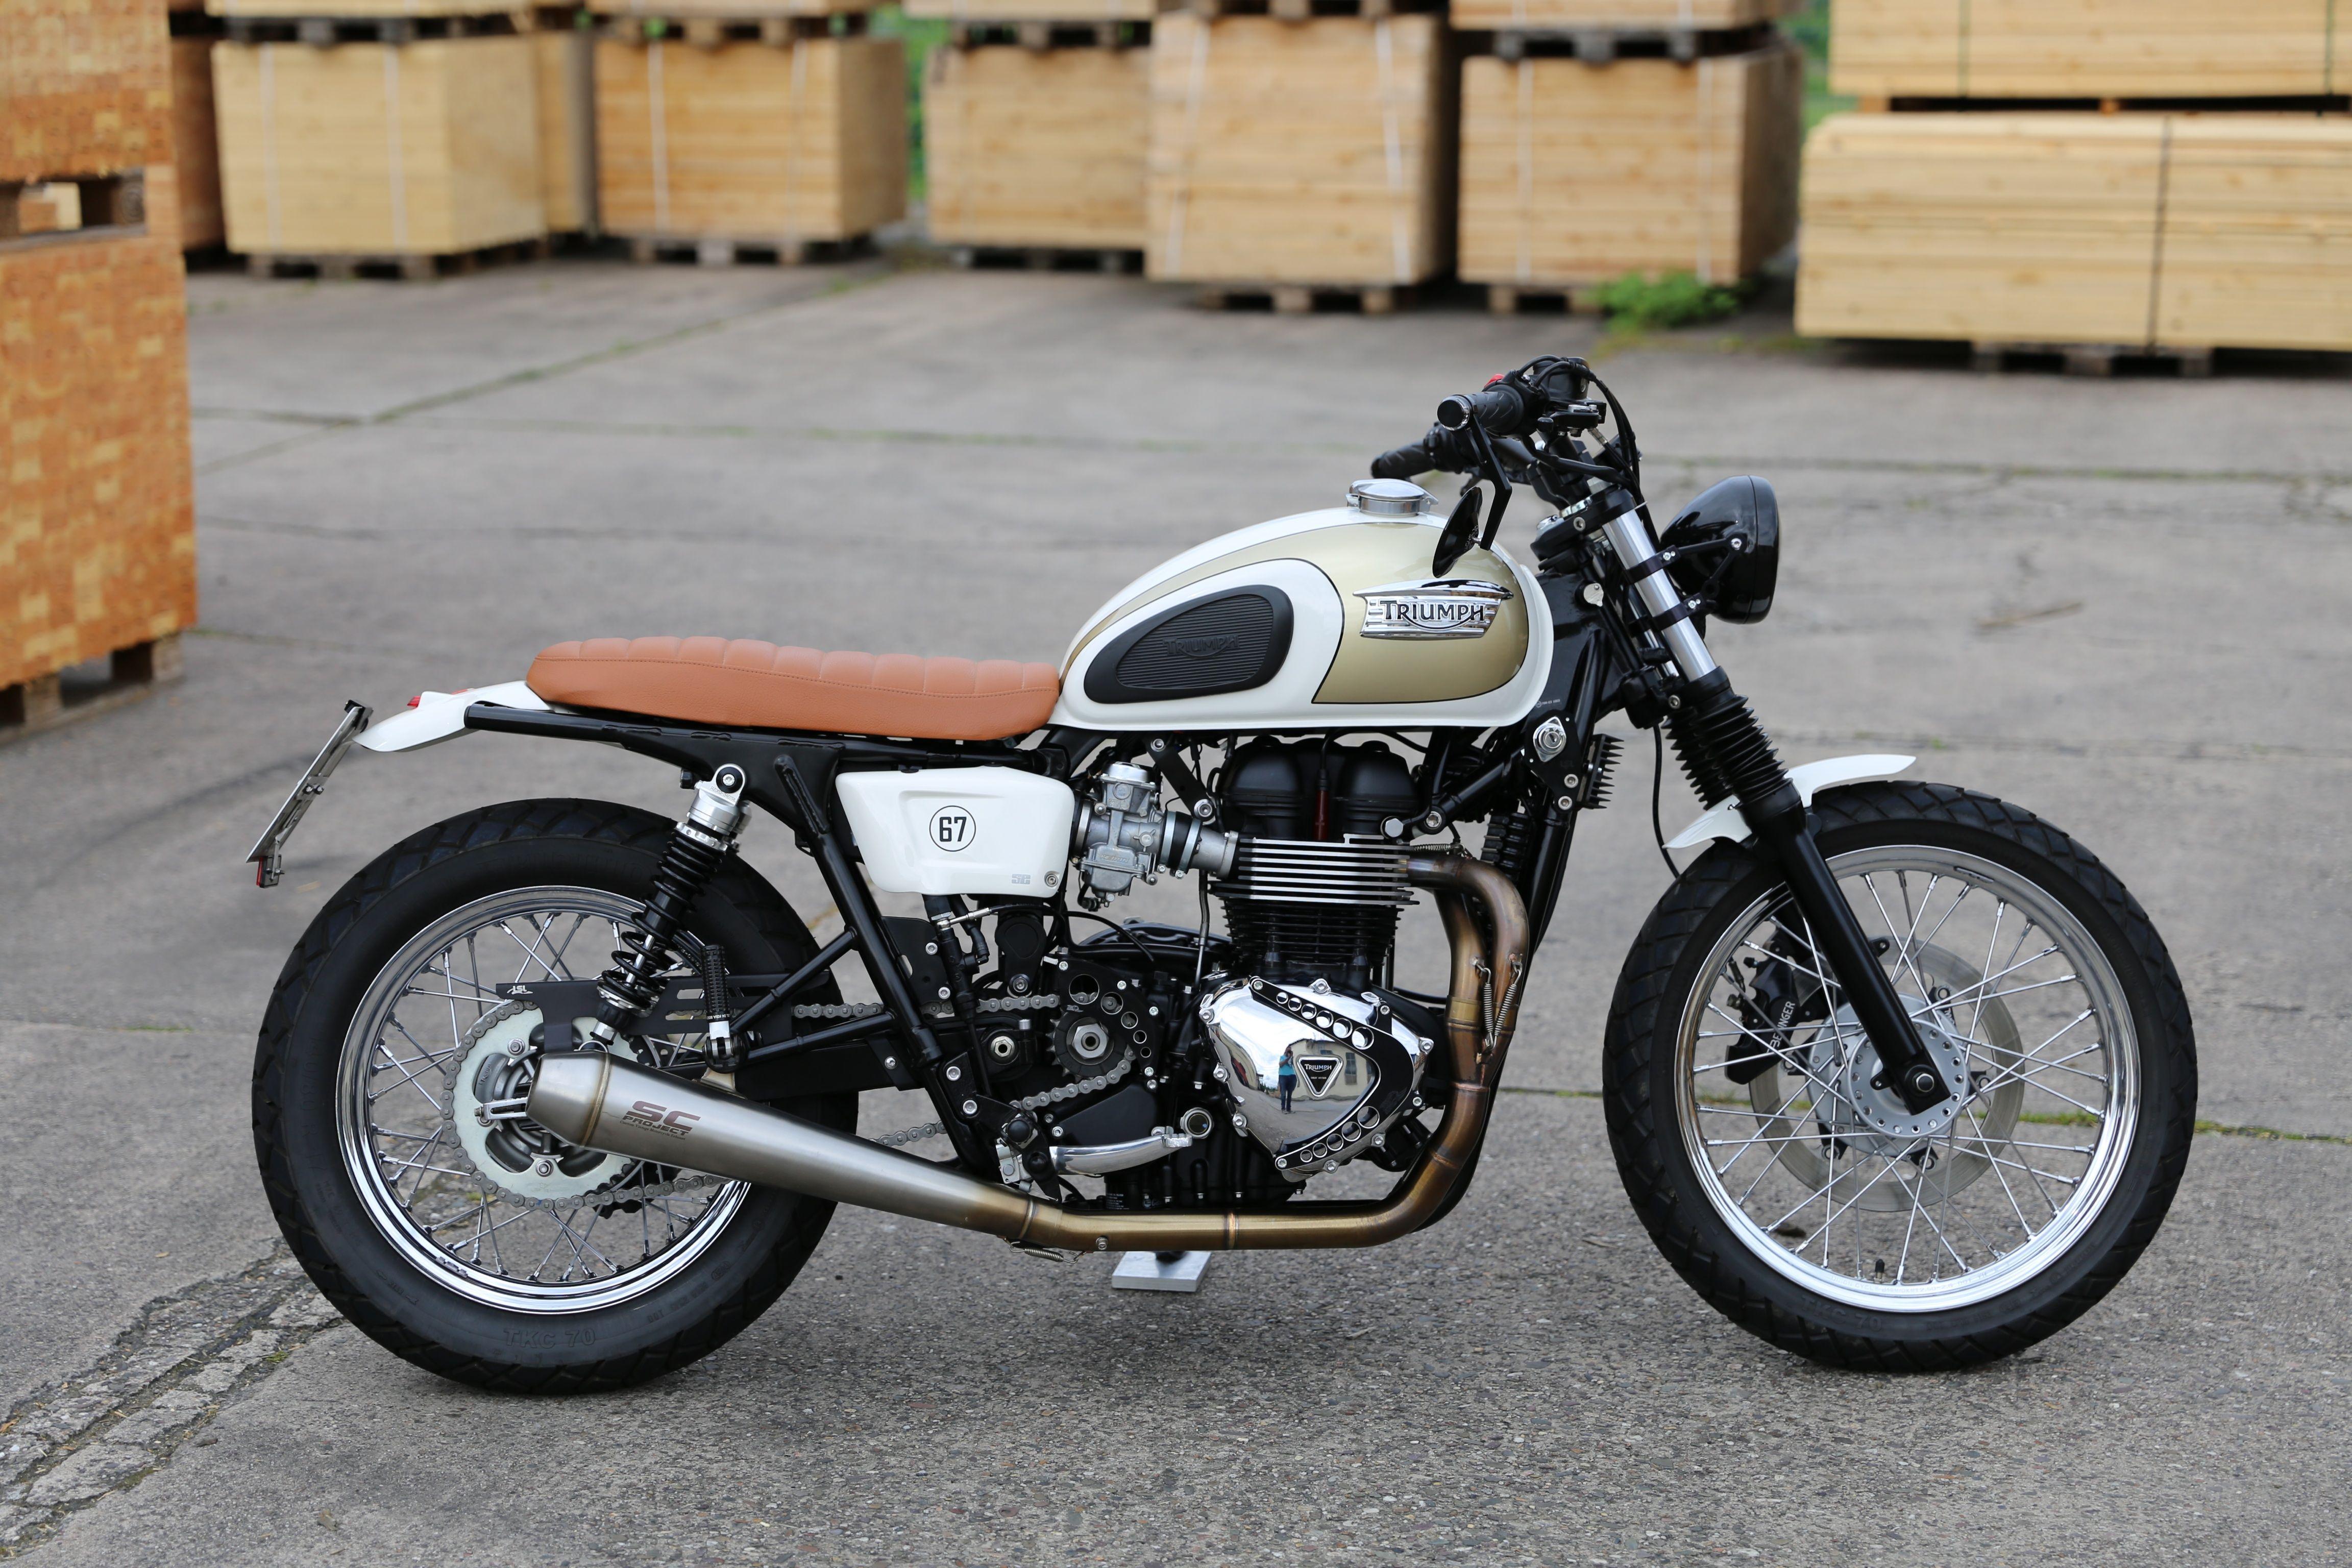 Pin by Nikos Kost on Μοτοσυκλέτες | Triumph moto, Triumph ...